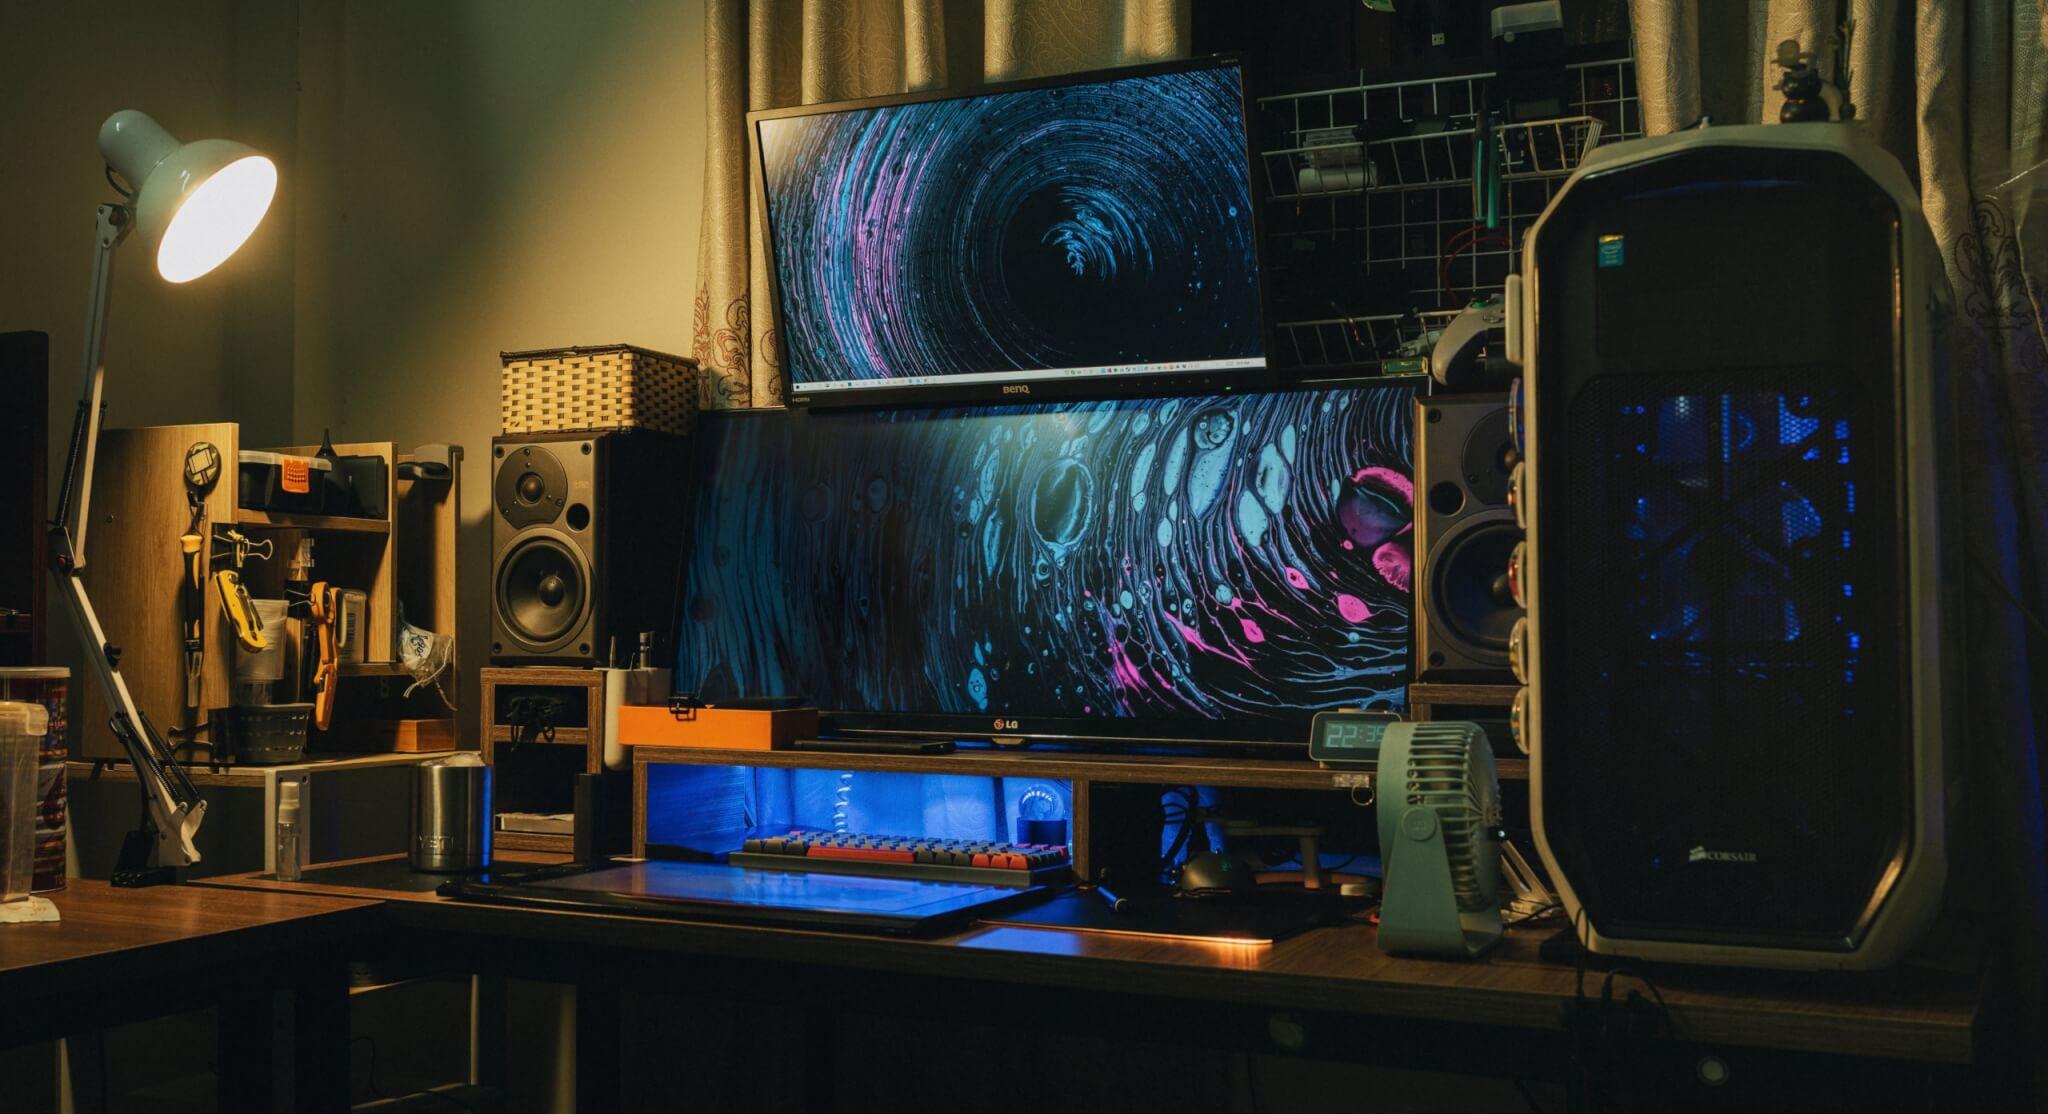 Ecrans ultra wide dans chambre sombre